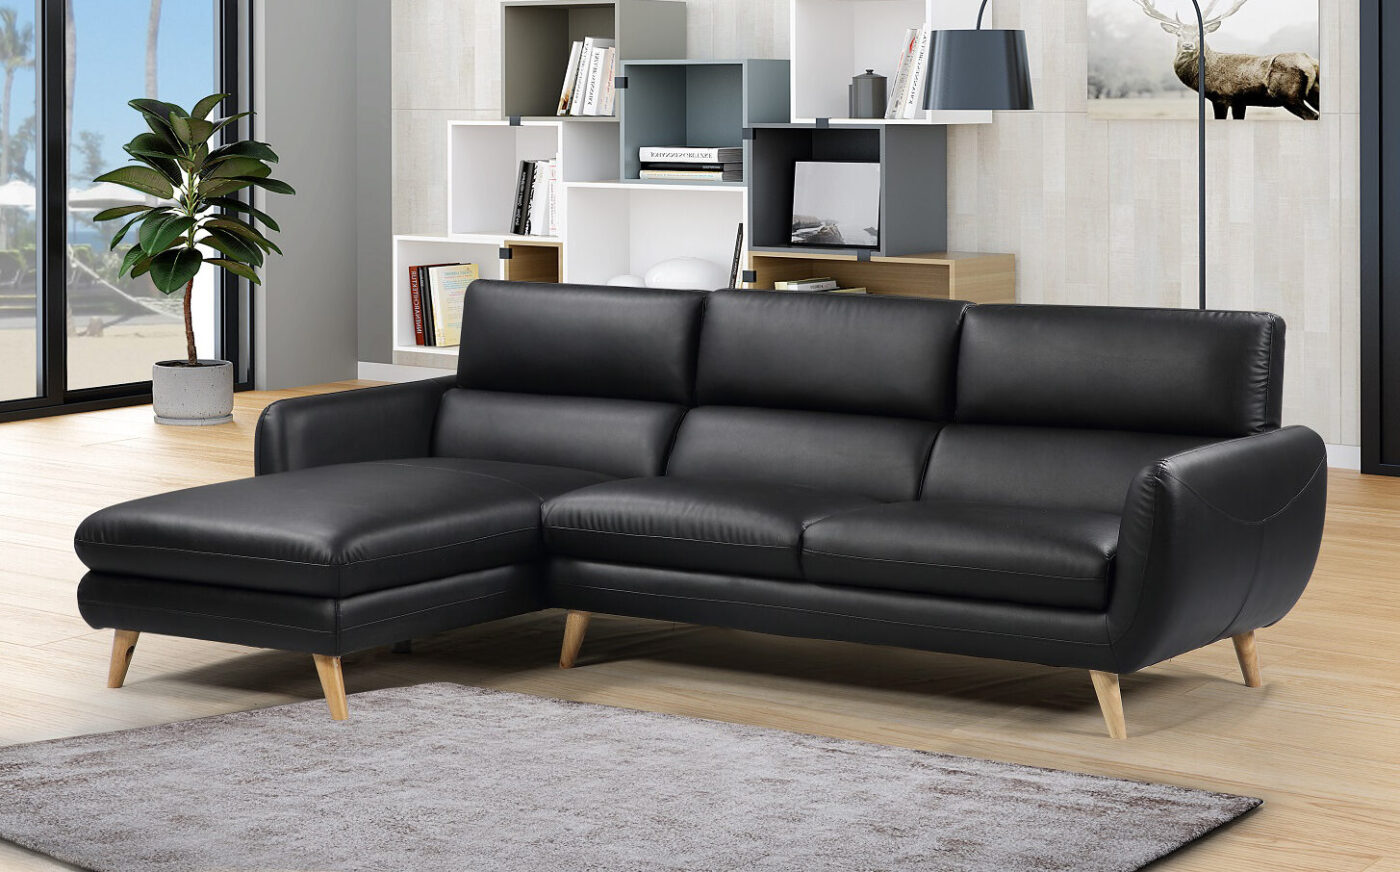 Picture of: 10 Chaiselong Sofaer I Laeder Som Tilforer Eksklusiv Charme Til Stuen